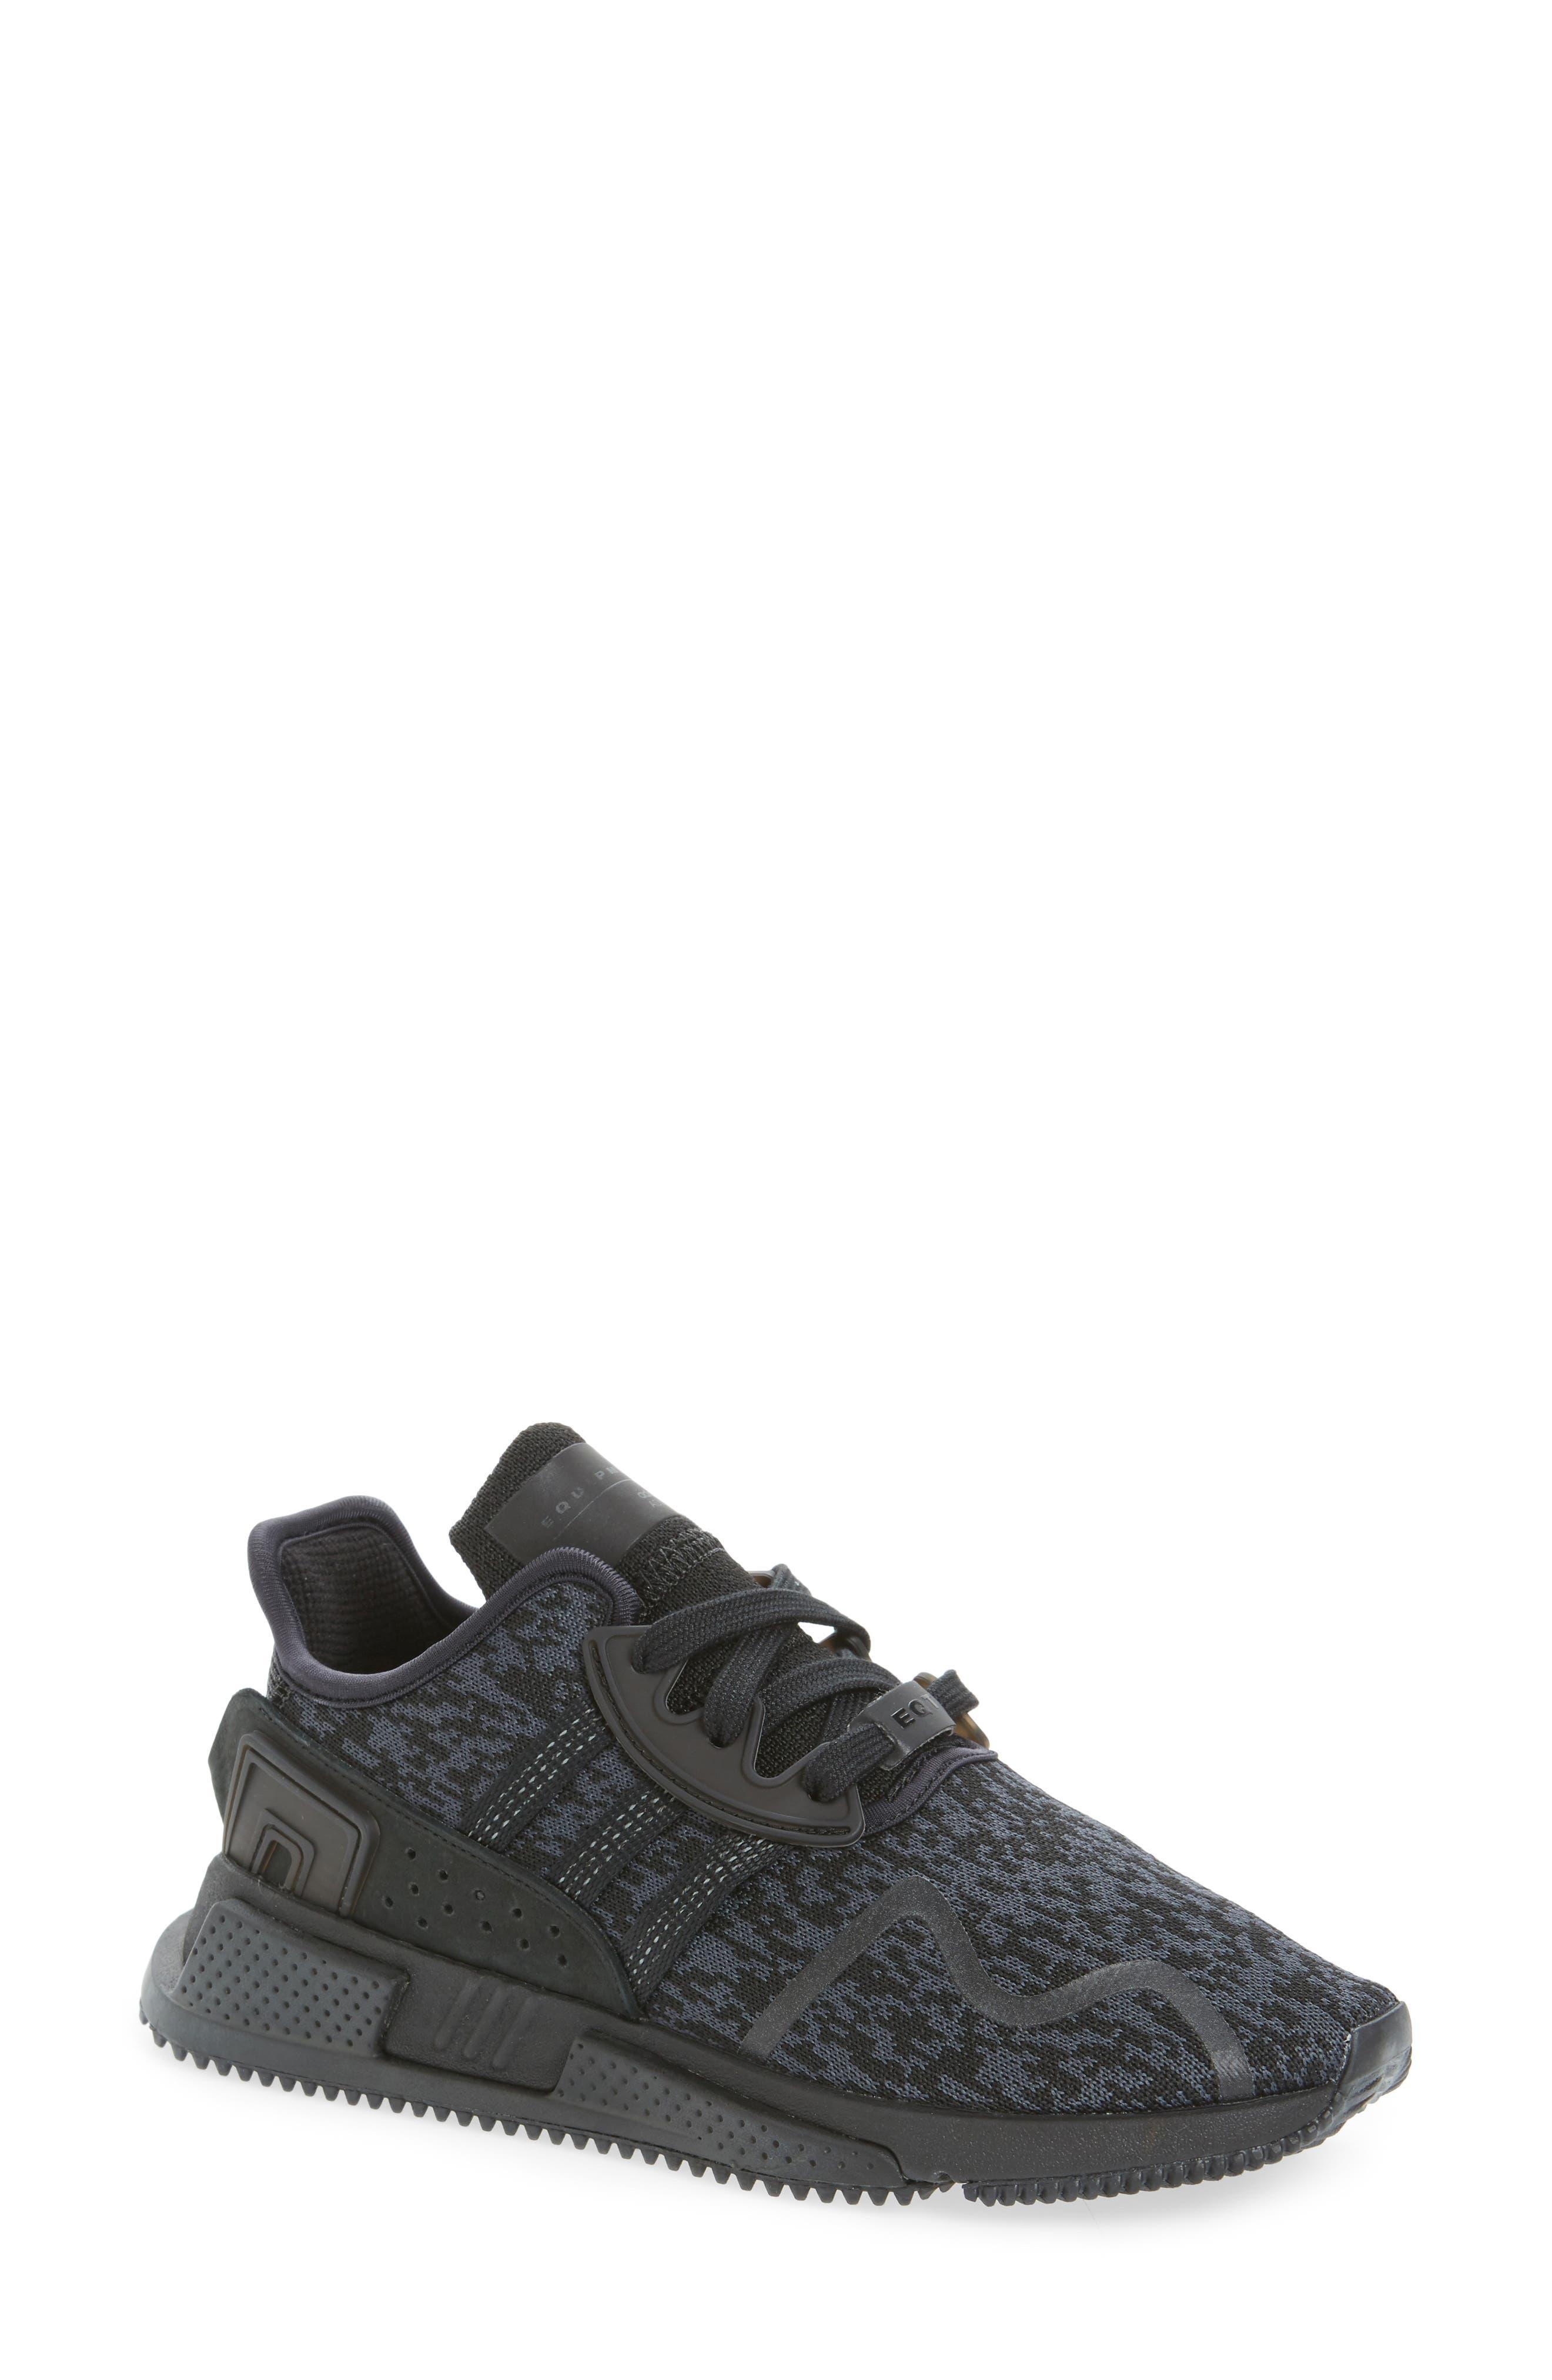 EQT Cushion ADV Sneaker,                         Main,                         color, Core Black/ Core Black/ White